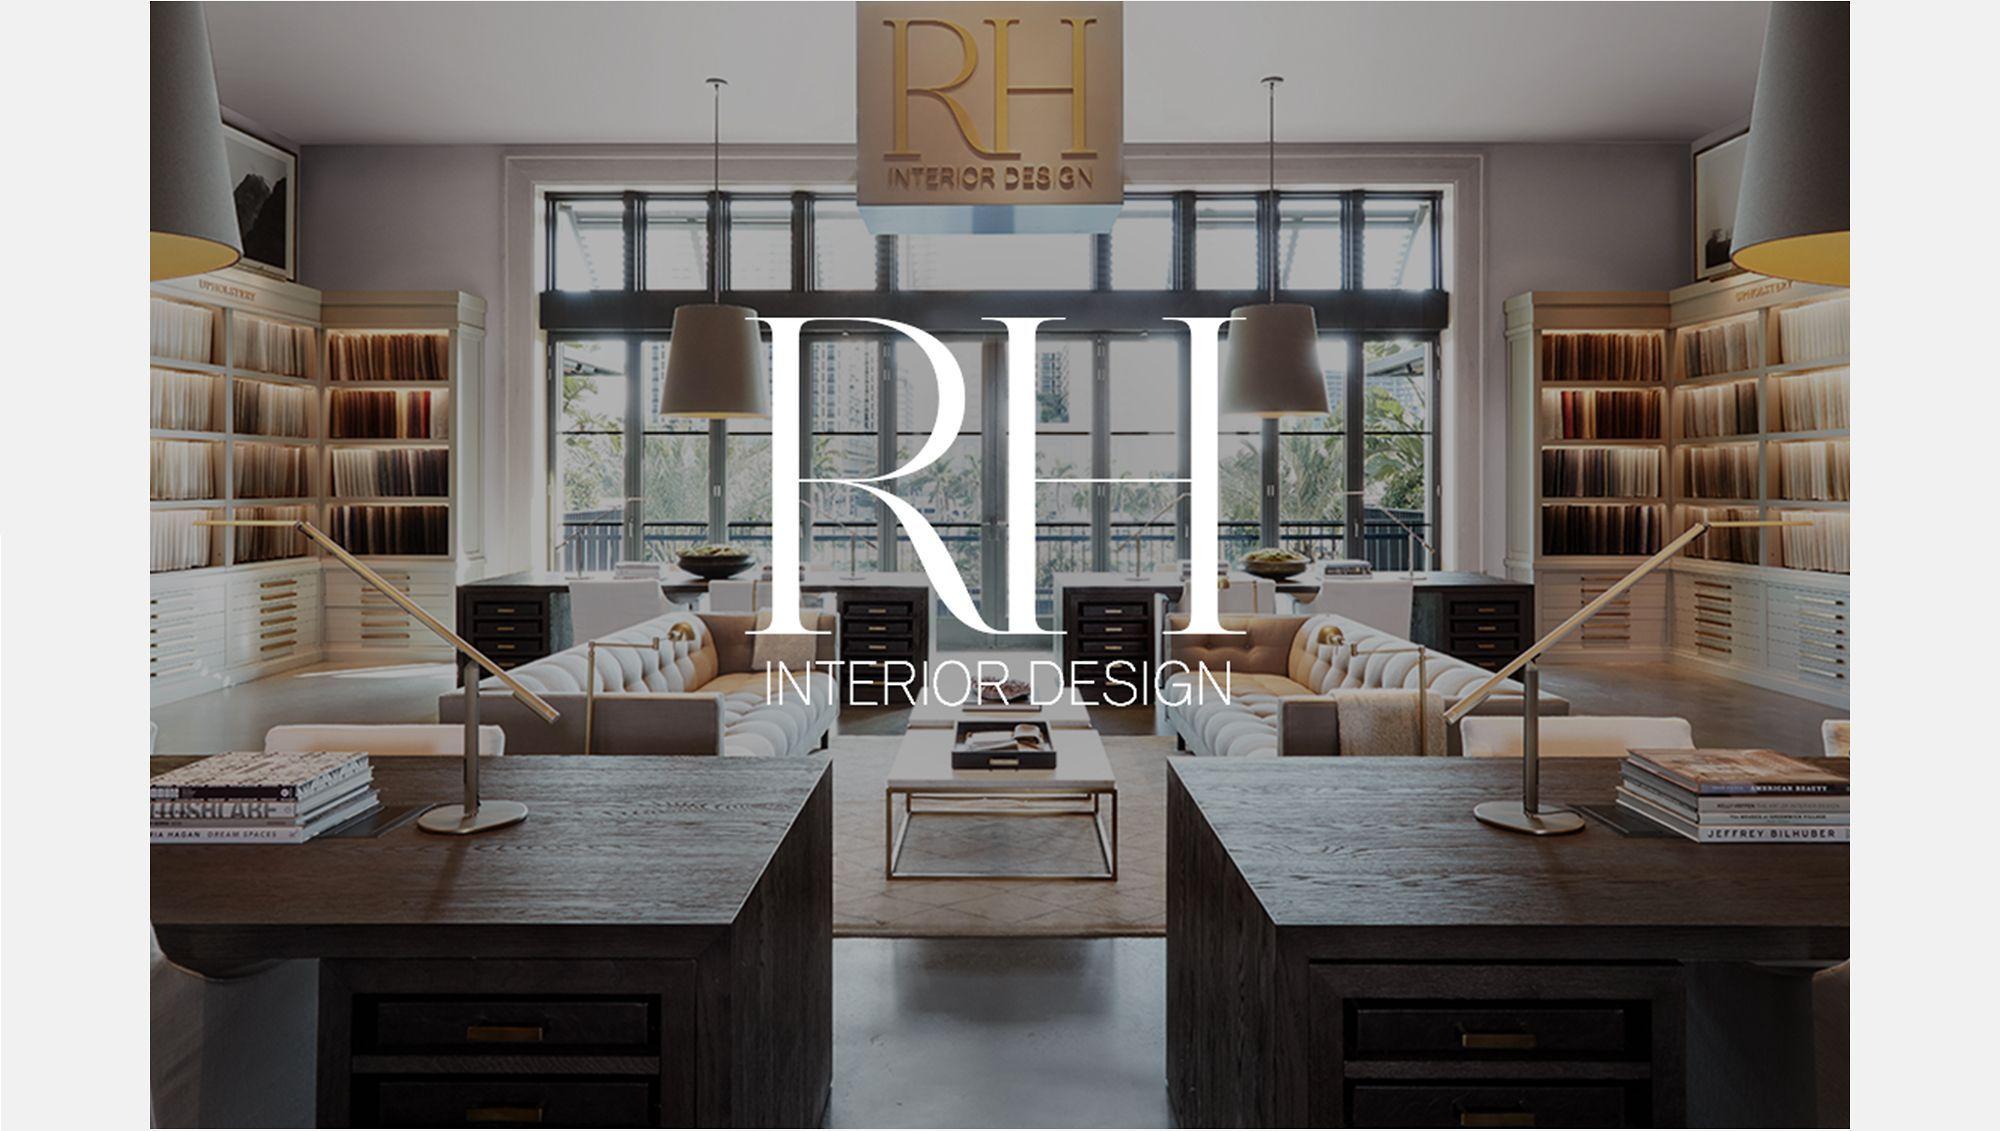 Design Atelier Rh Modern Interior Interior Design Design